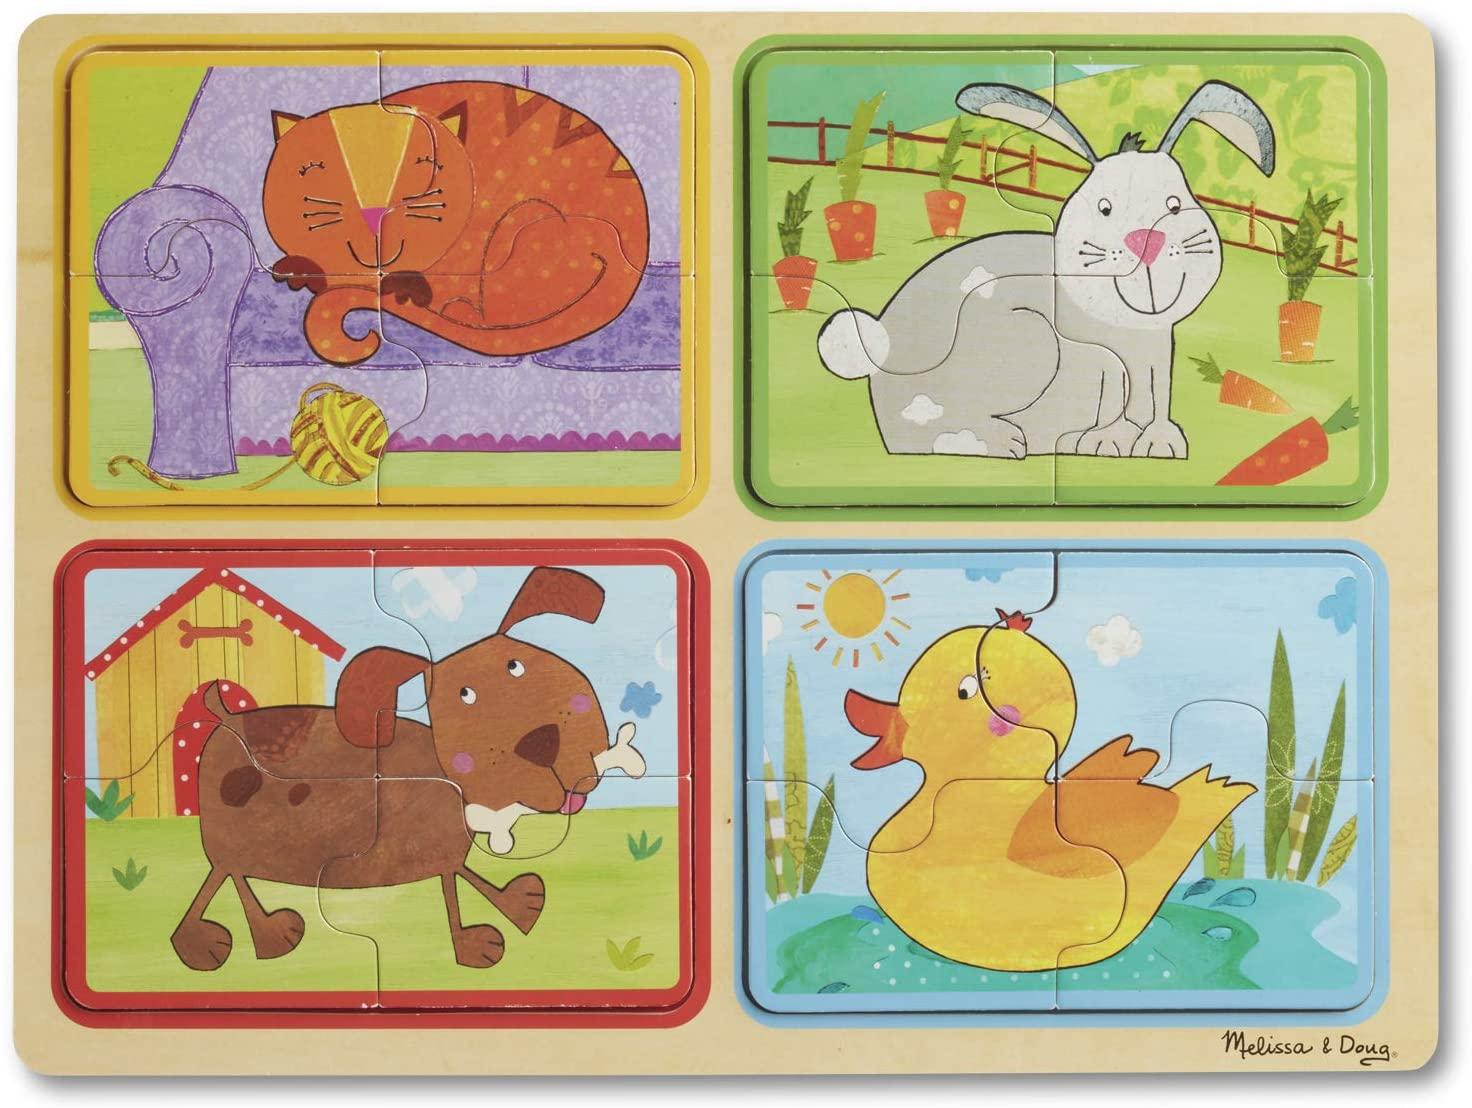 Melissa & Doug Natural Play Wooden Puzzle: Playful Pals (Four 4-Piece Animal Puzzles)